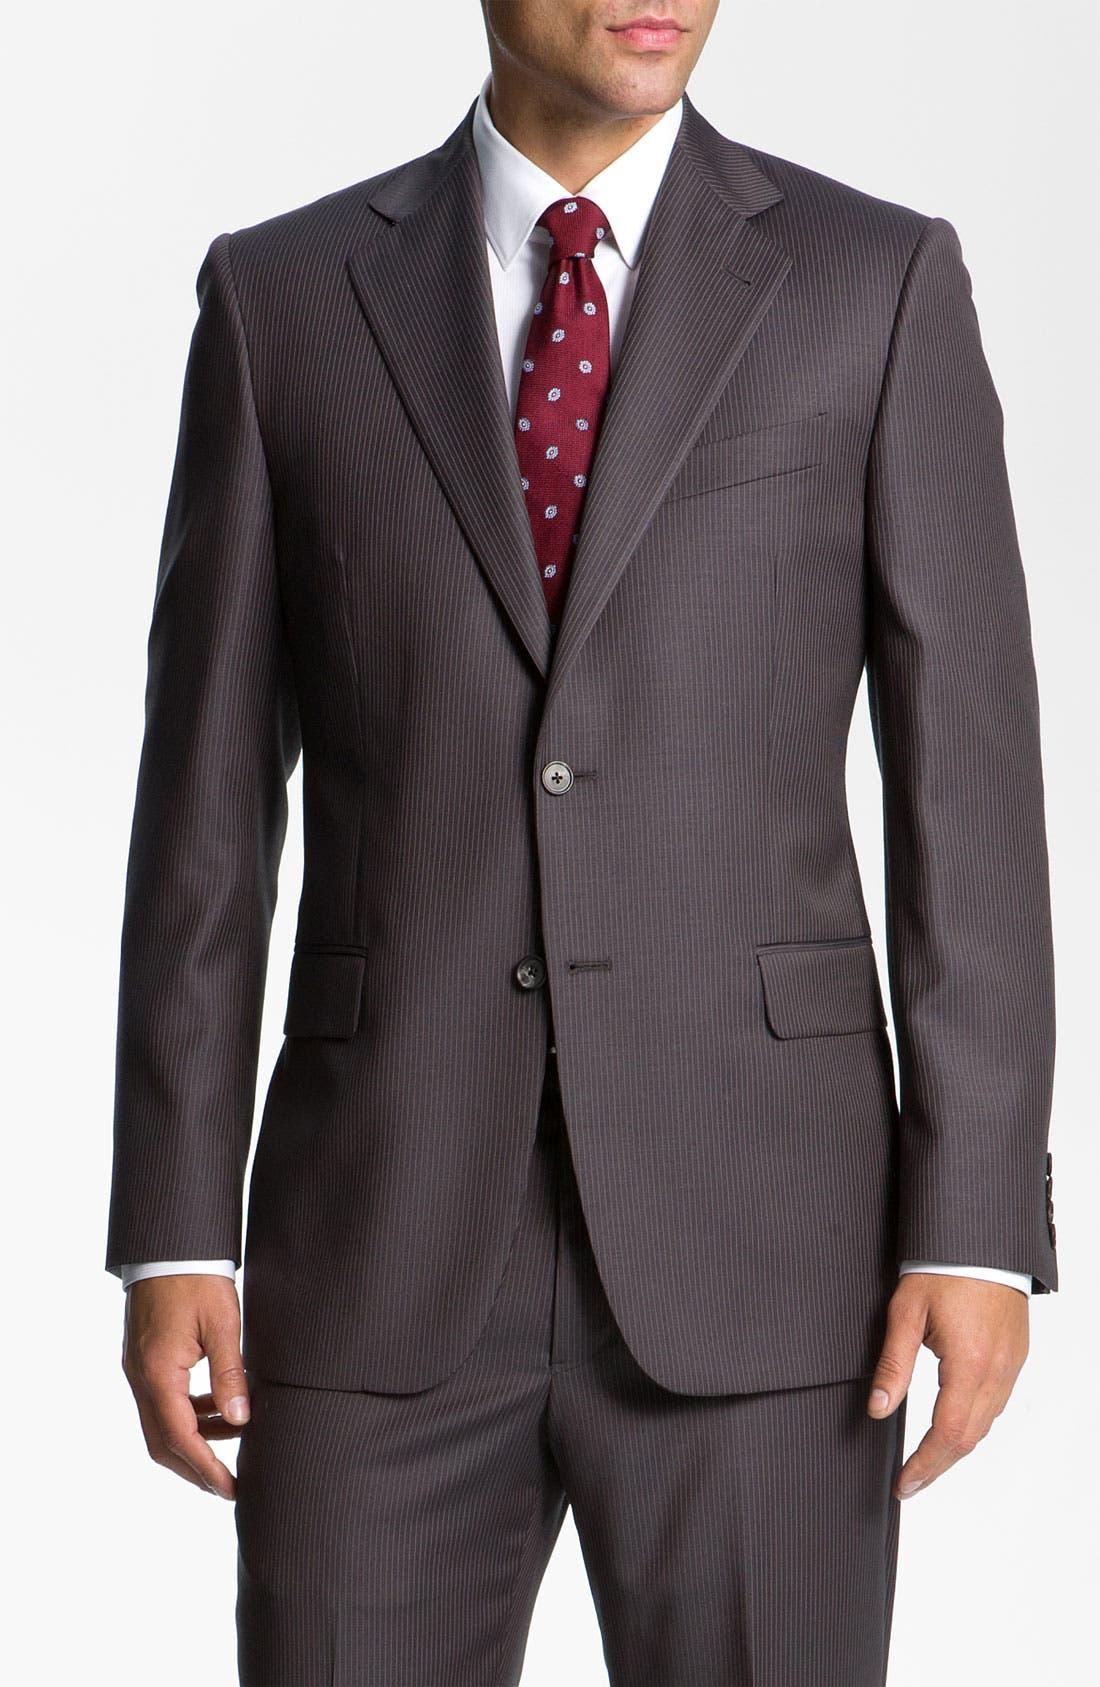 Main Image - Joseph Abboud Pinstripe Suit